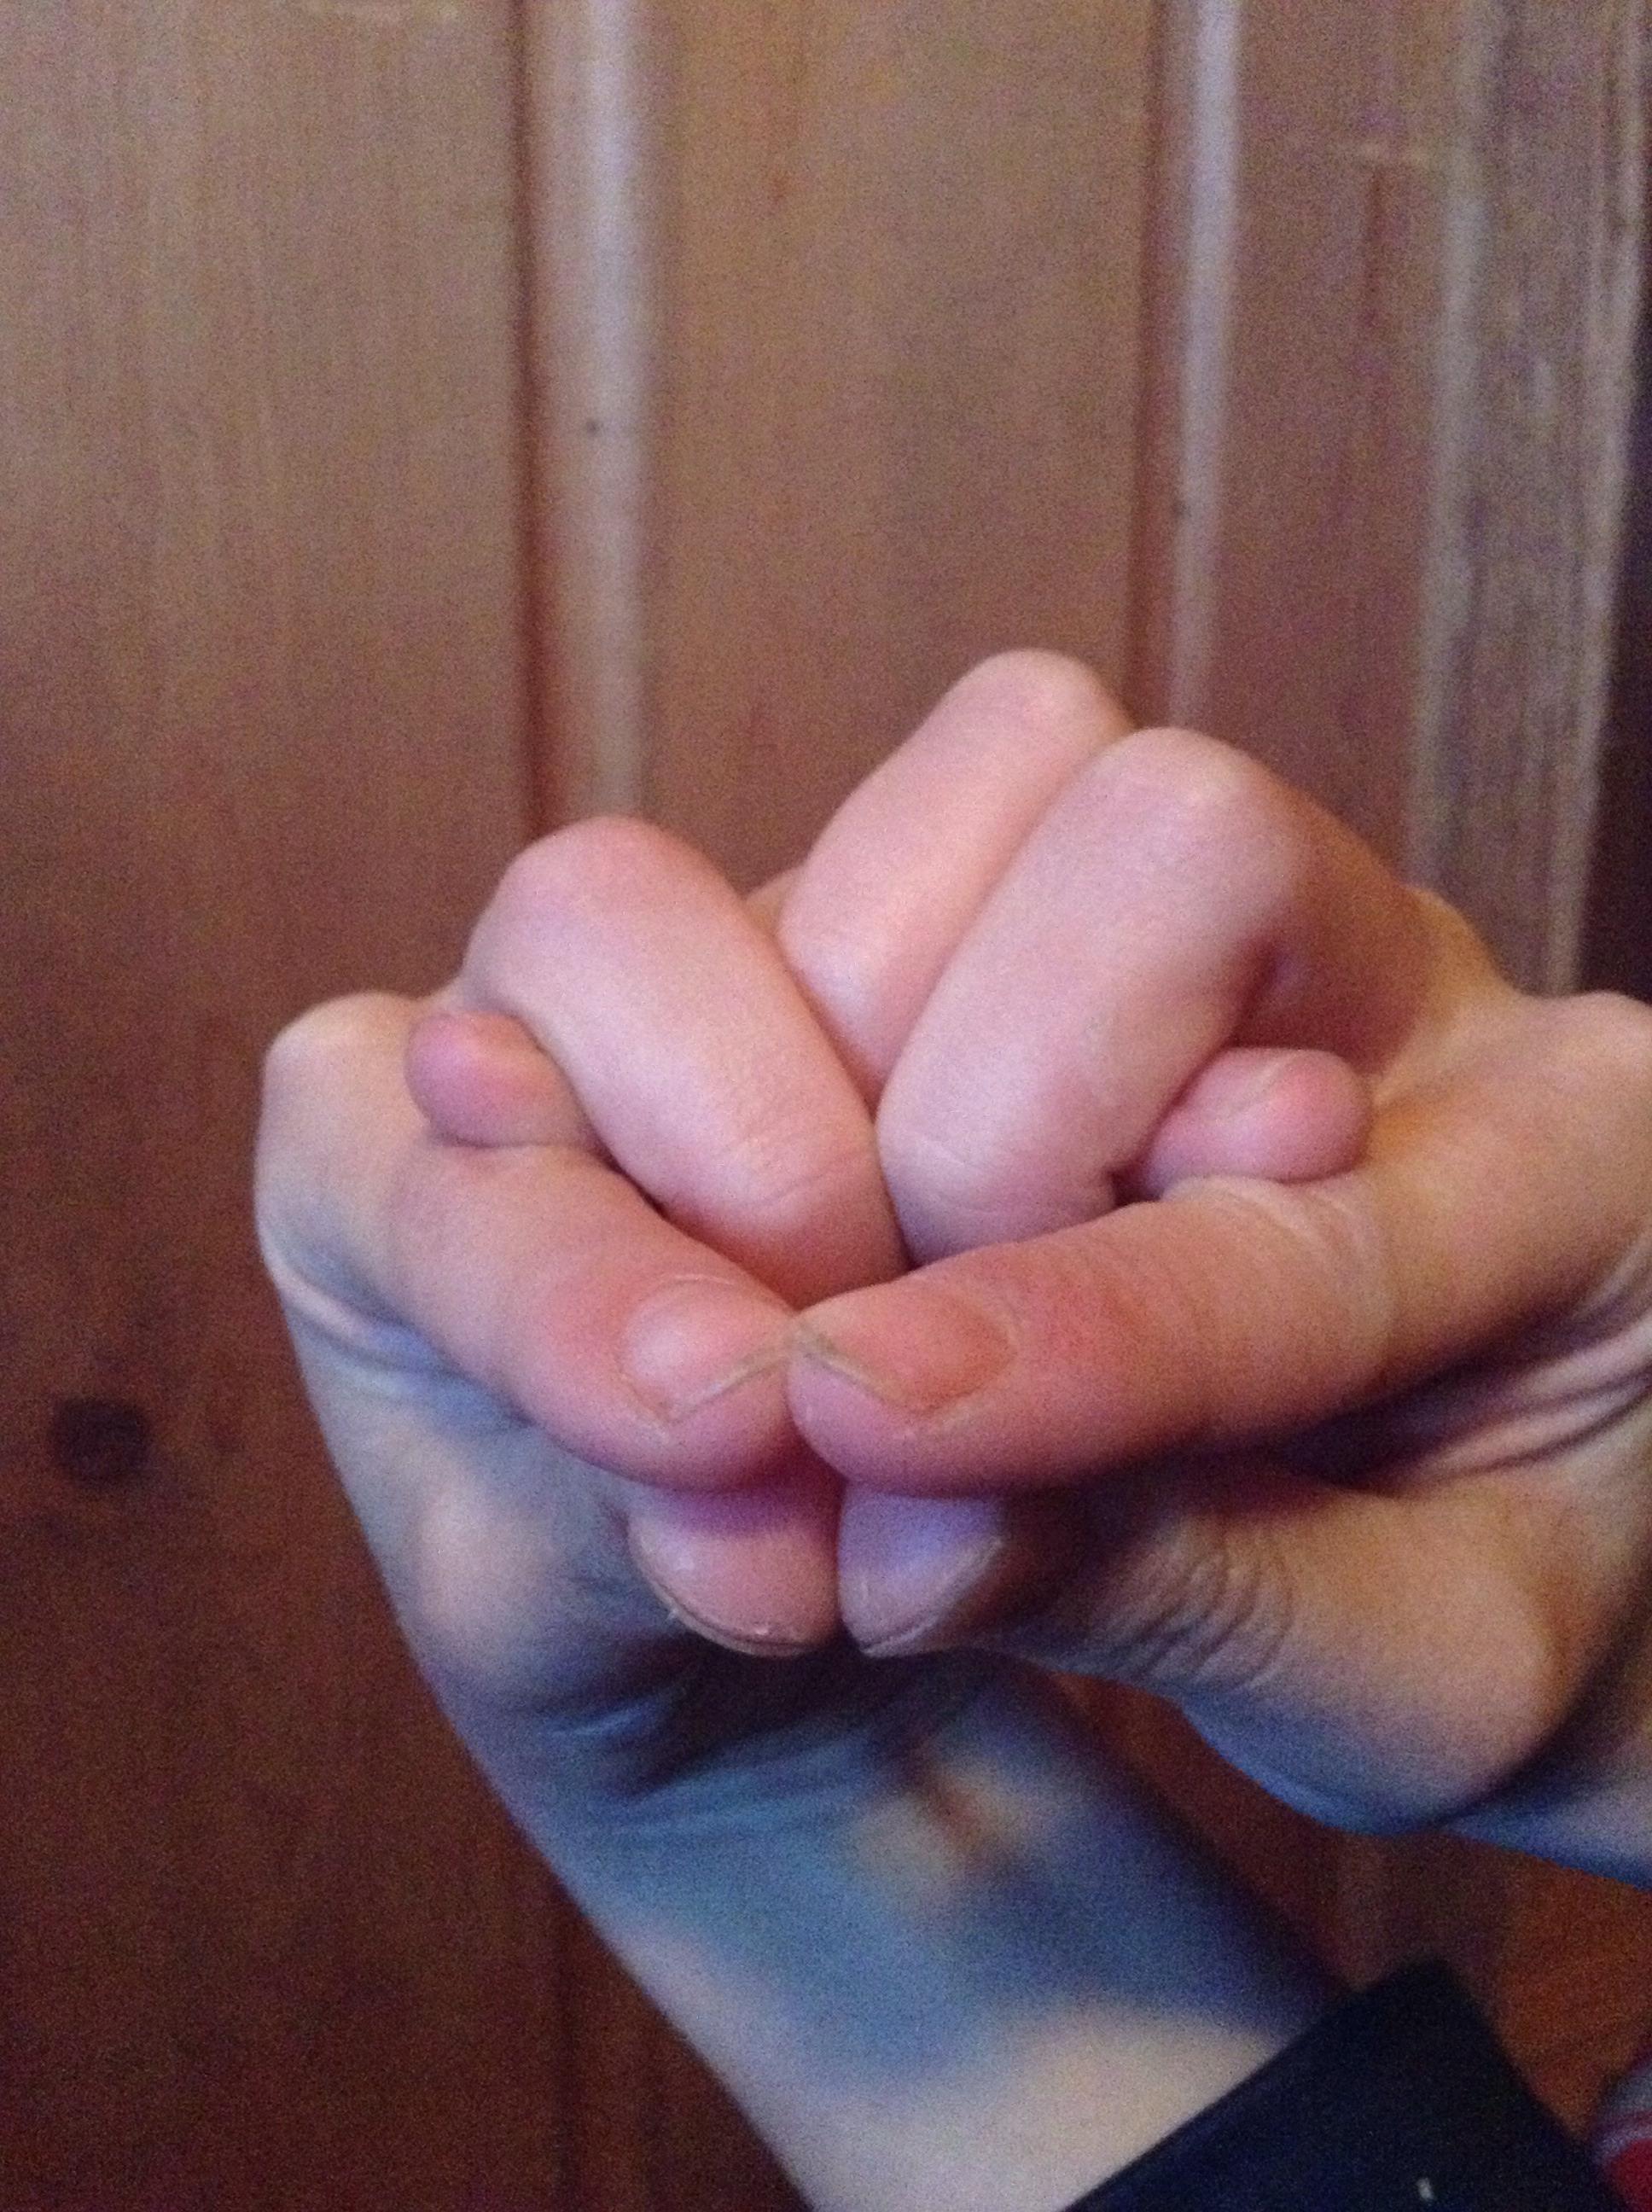 Snake Hands!